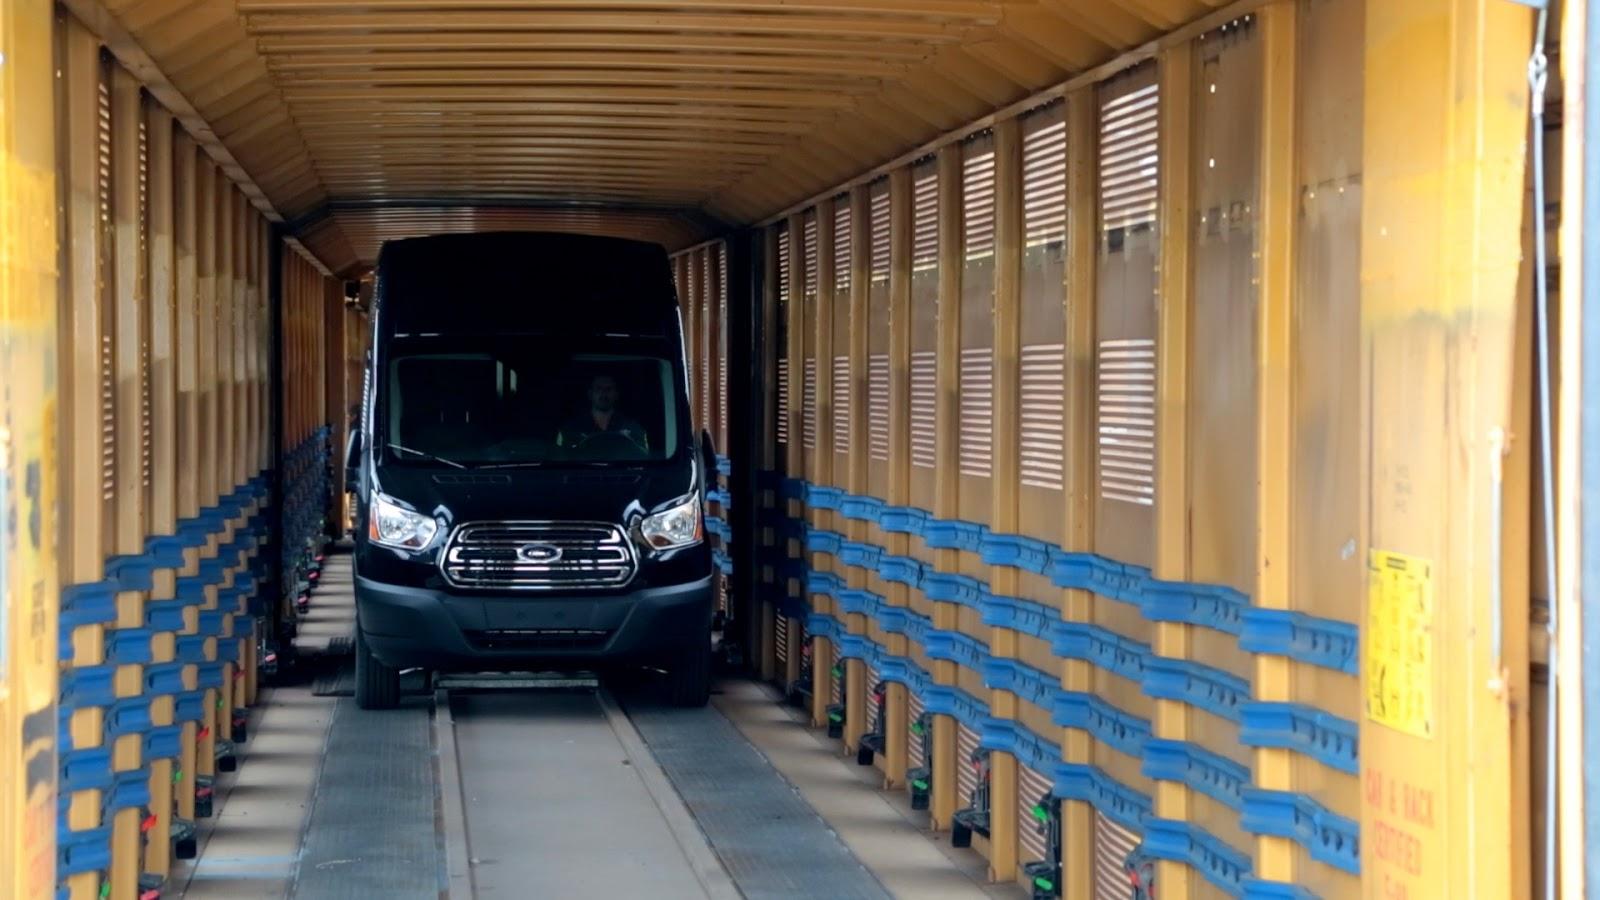 2014 Ford Transit High Roof black rail car